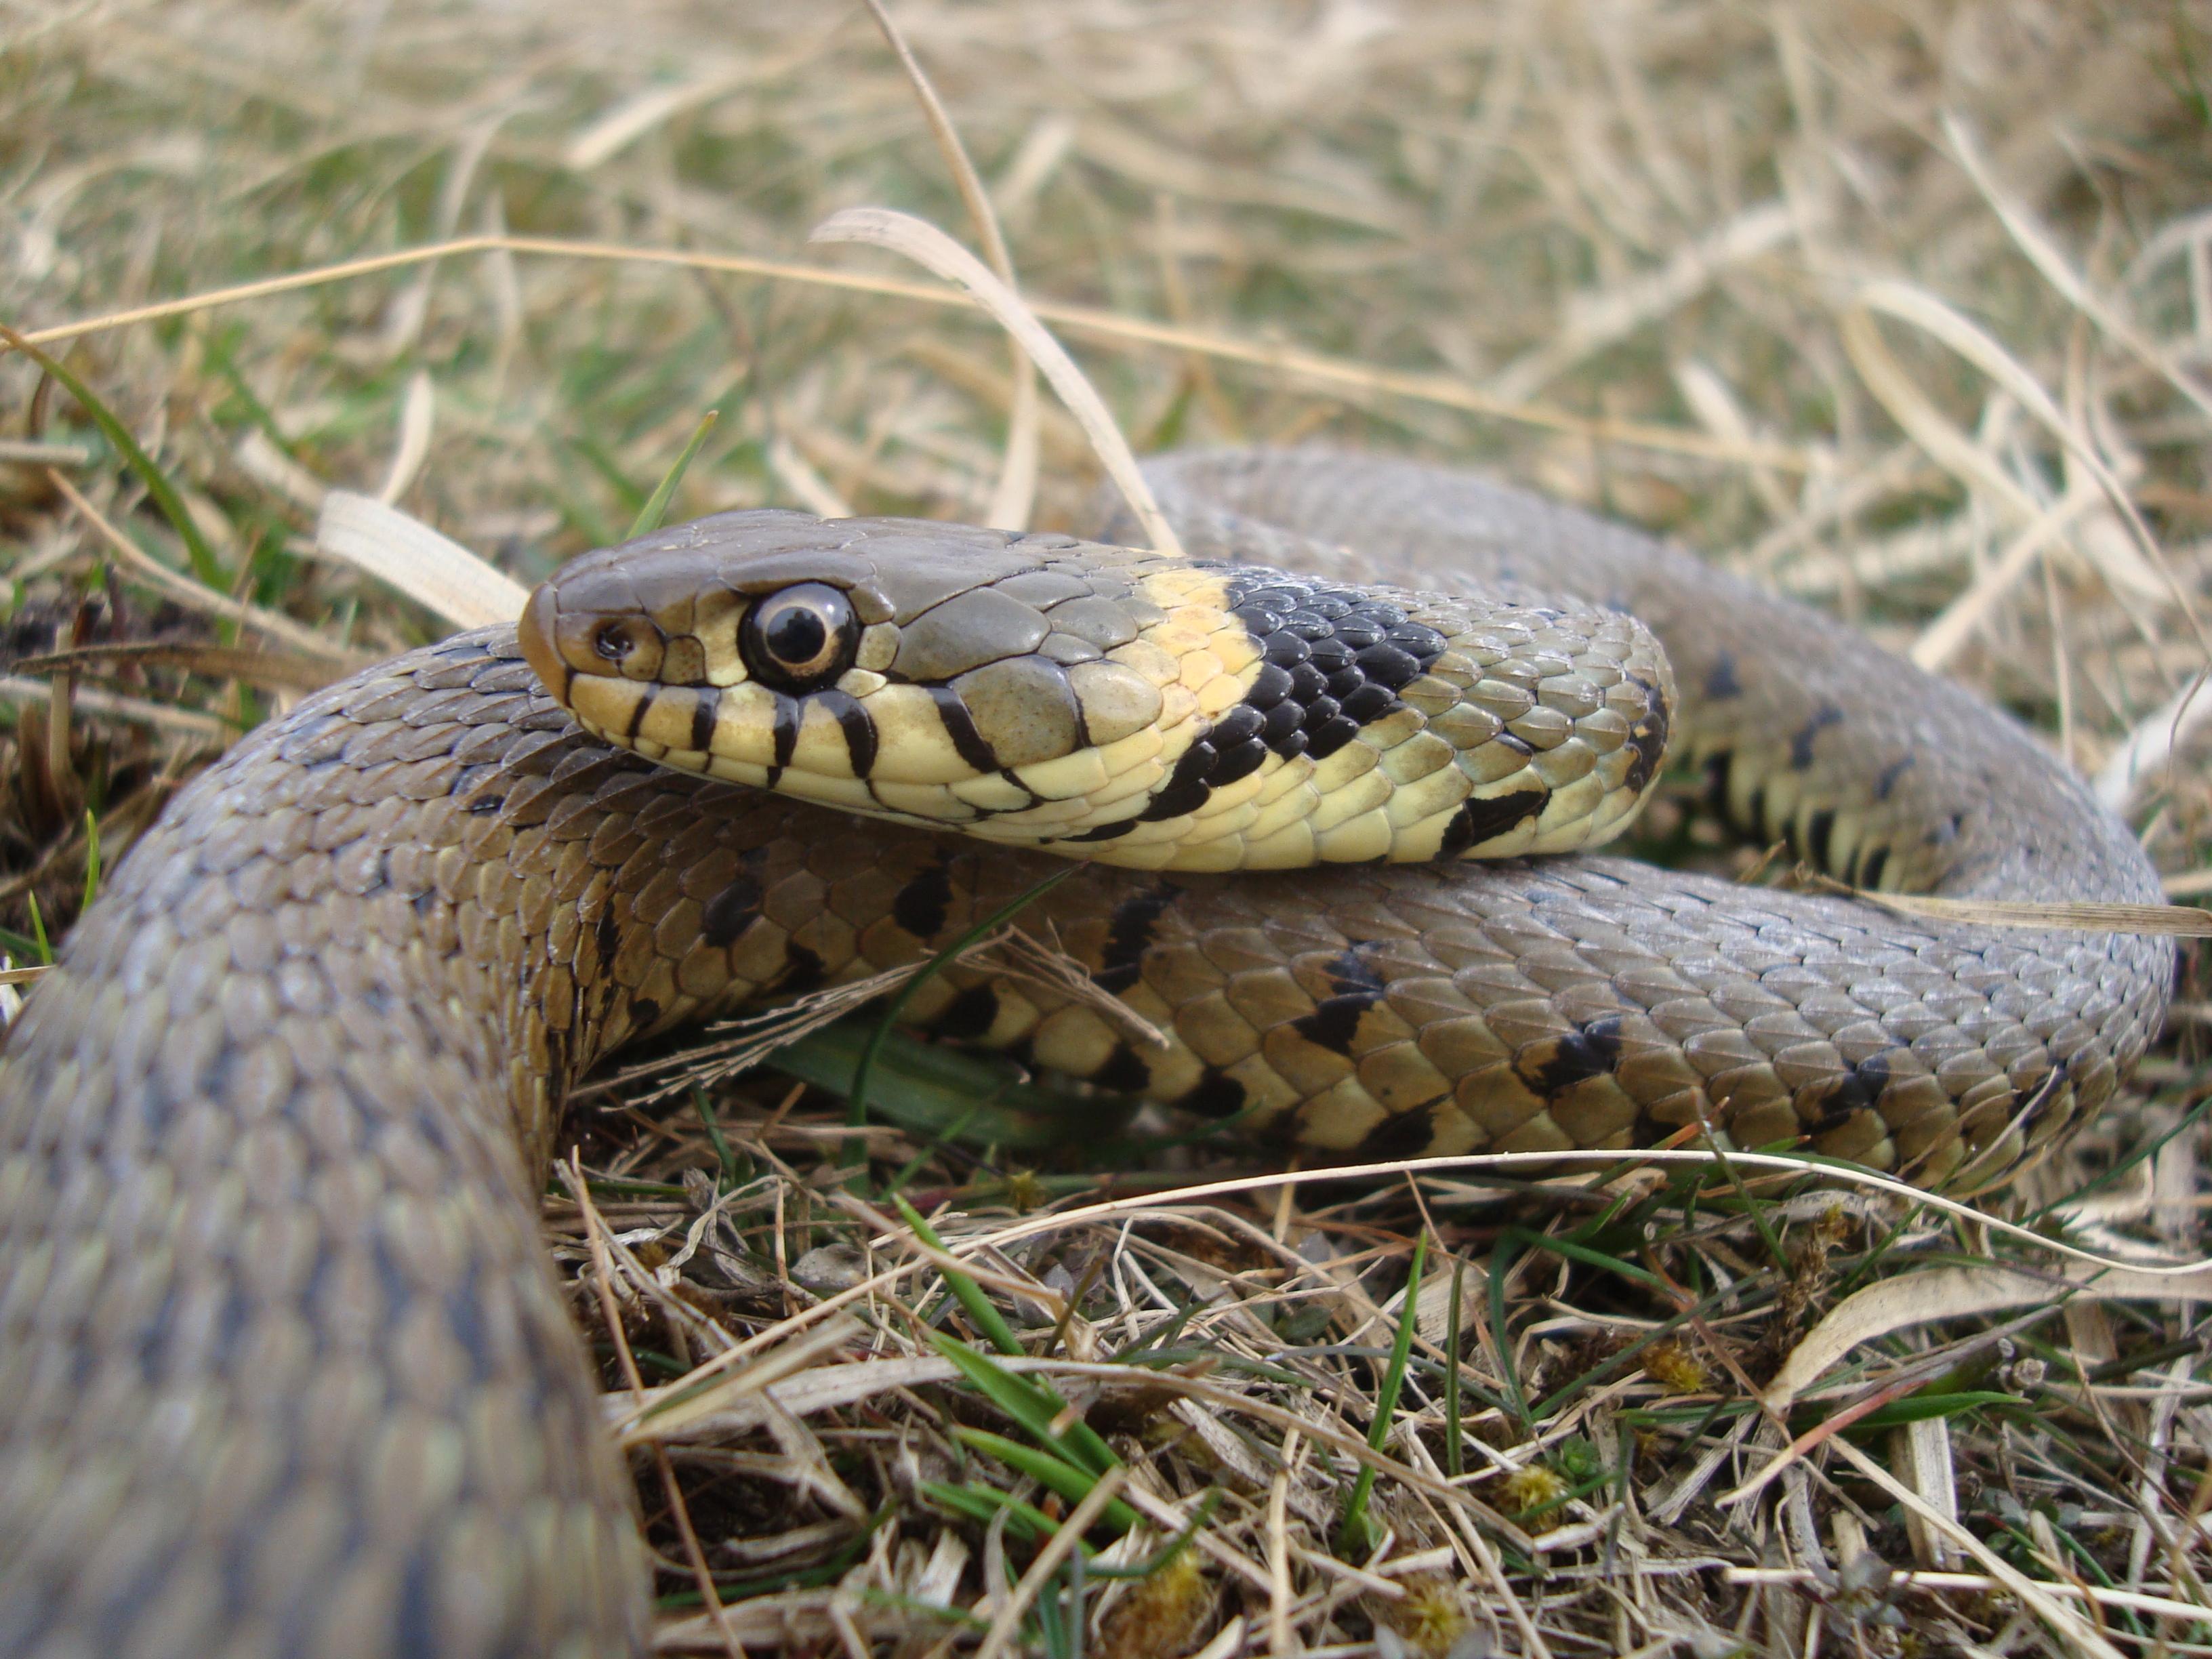 Scotland Has a New Snake